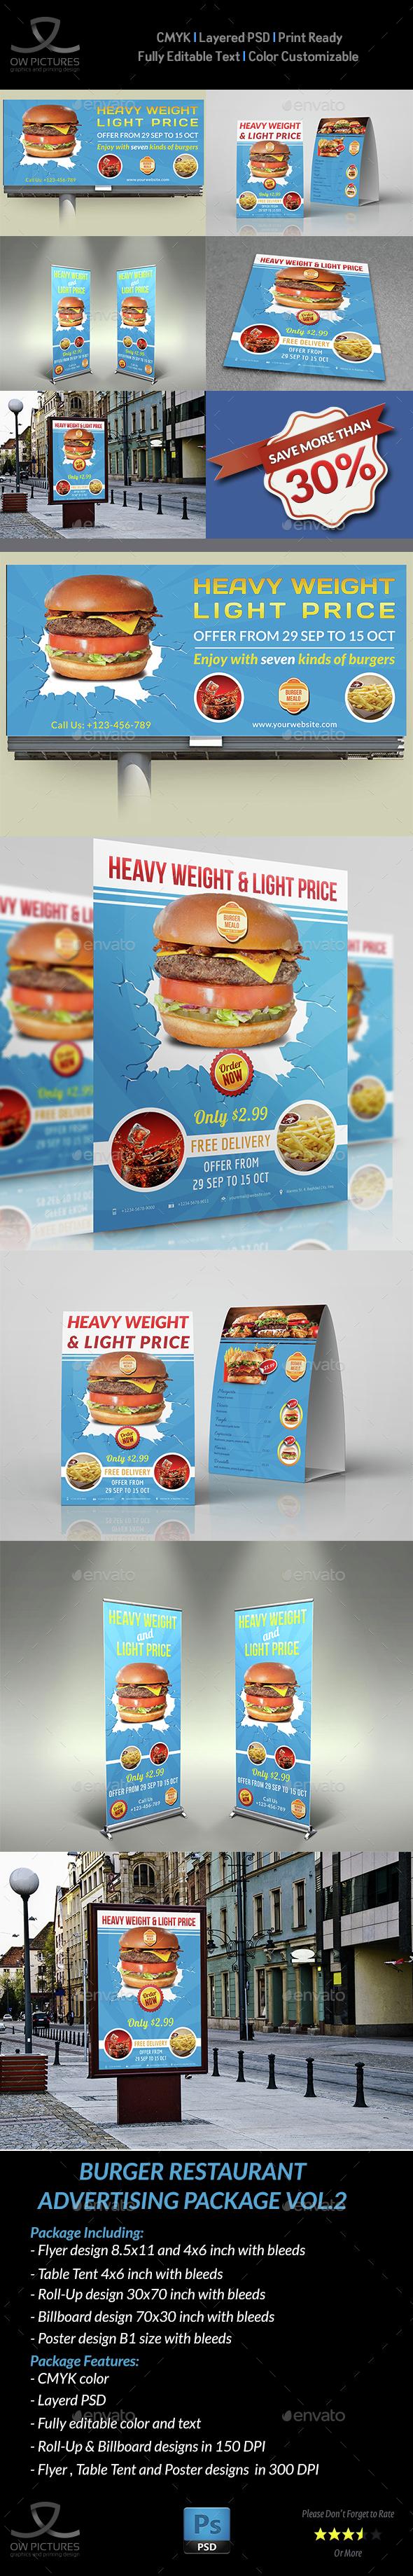 Burger Restaurant Advertising Bundle Template Vol.2 - Signage Print Templates